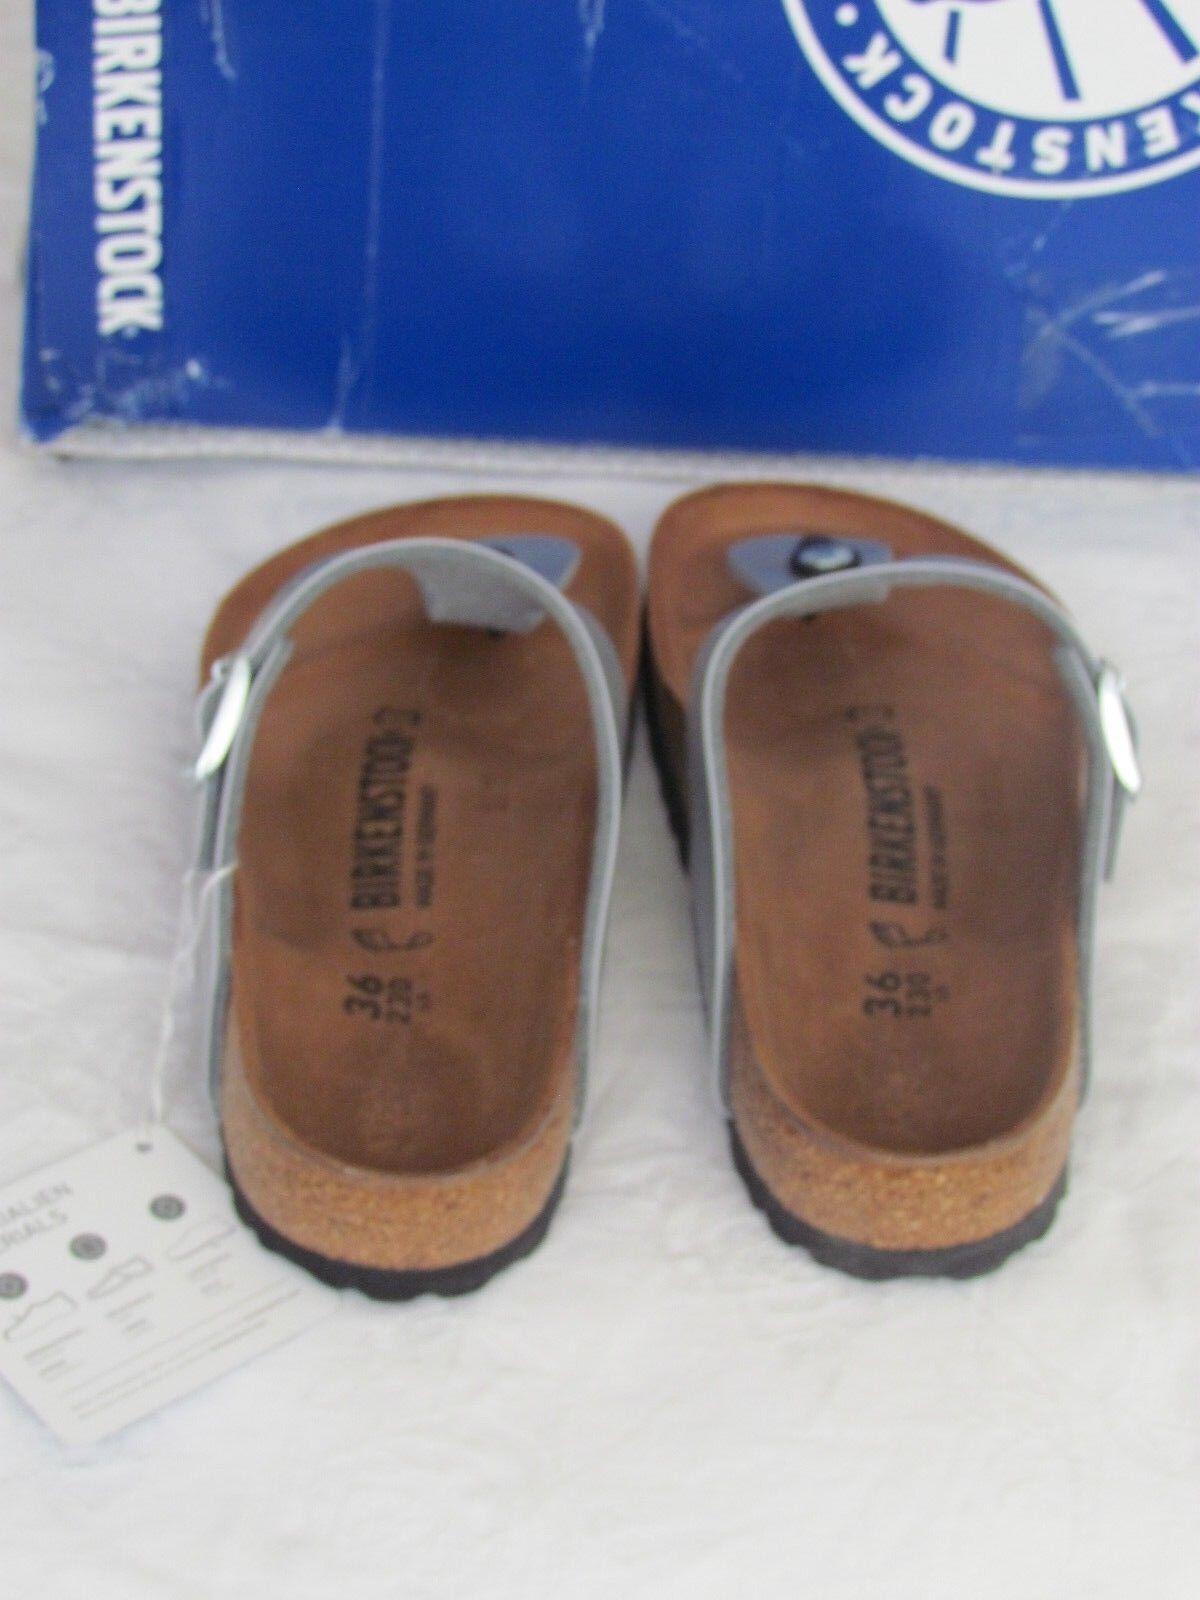 Nuevo Birkenstock Gizeh Señoras Plata Toe Post Mulas Sandalias UK Size 3.5